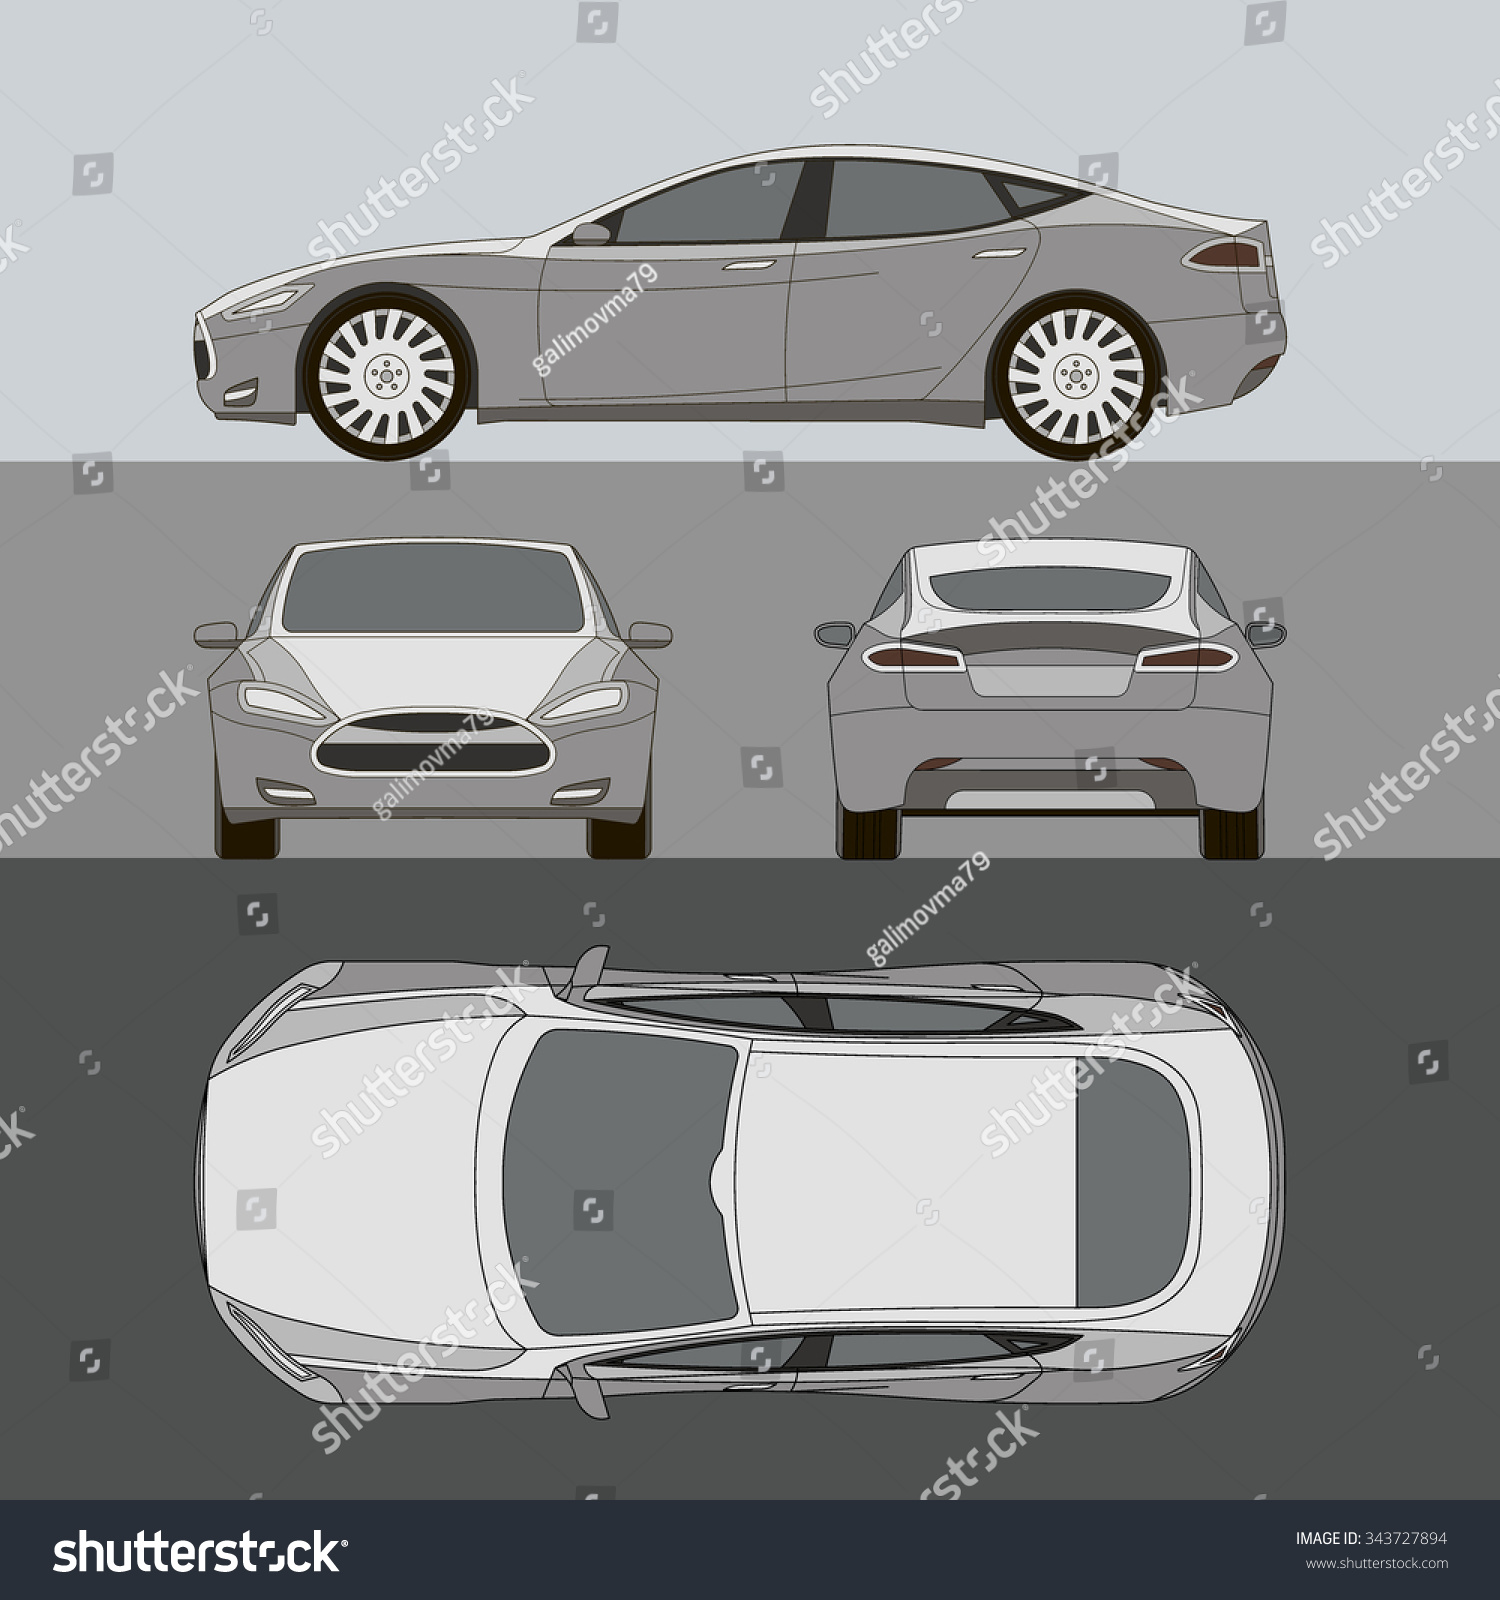 car all view top front side stock vektor 343727894 shutterstock. Black Bedroom Furniture Sets. Home Design Ideas